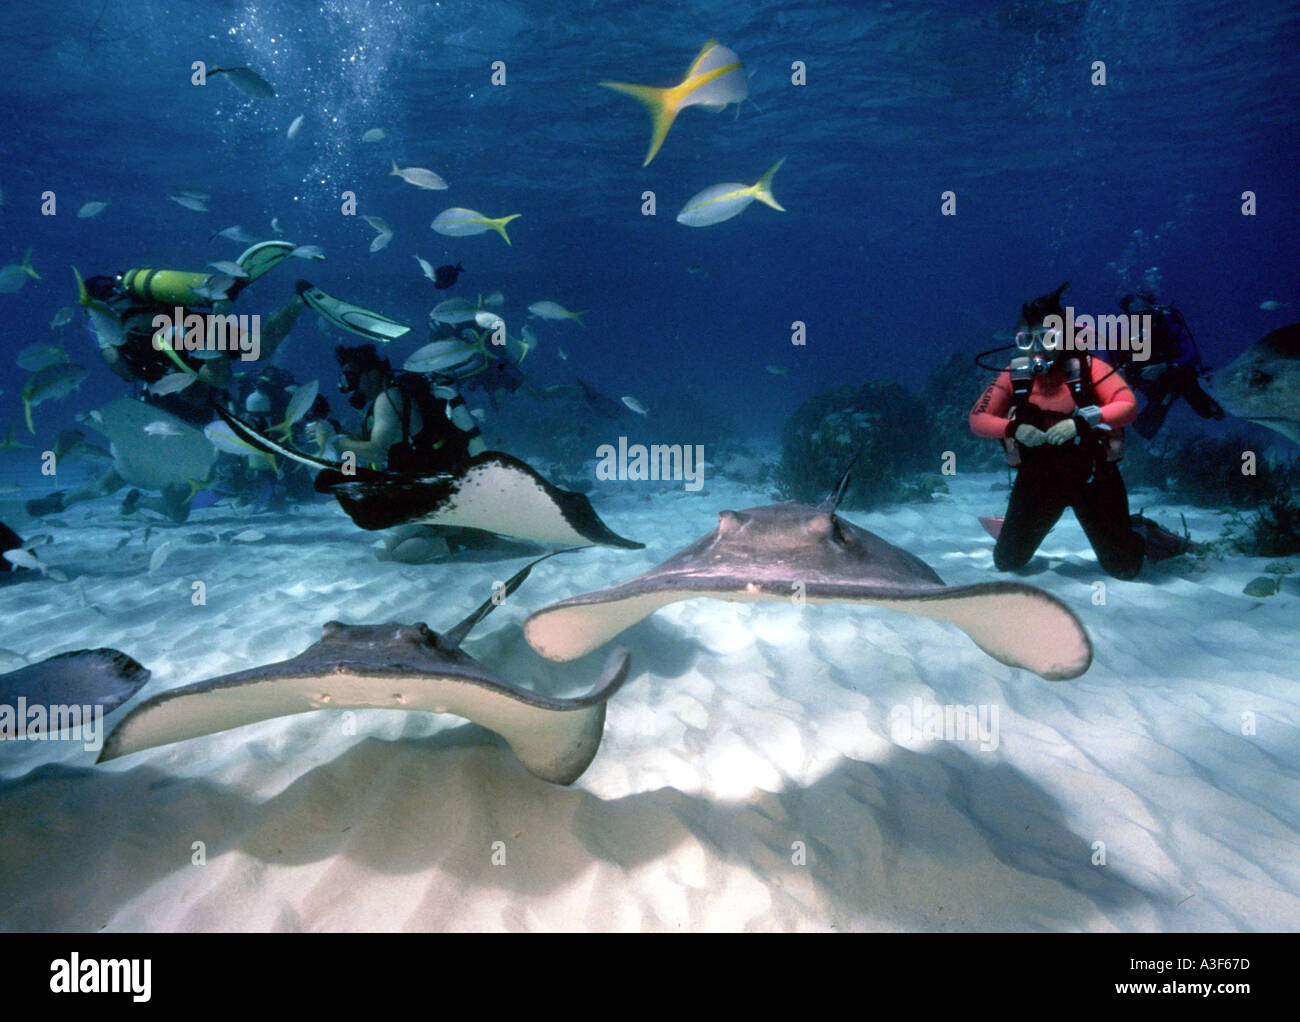 underwater, stingray city, cayman islands, stingrays, diverStock Photo